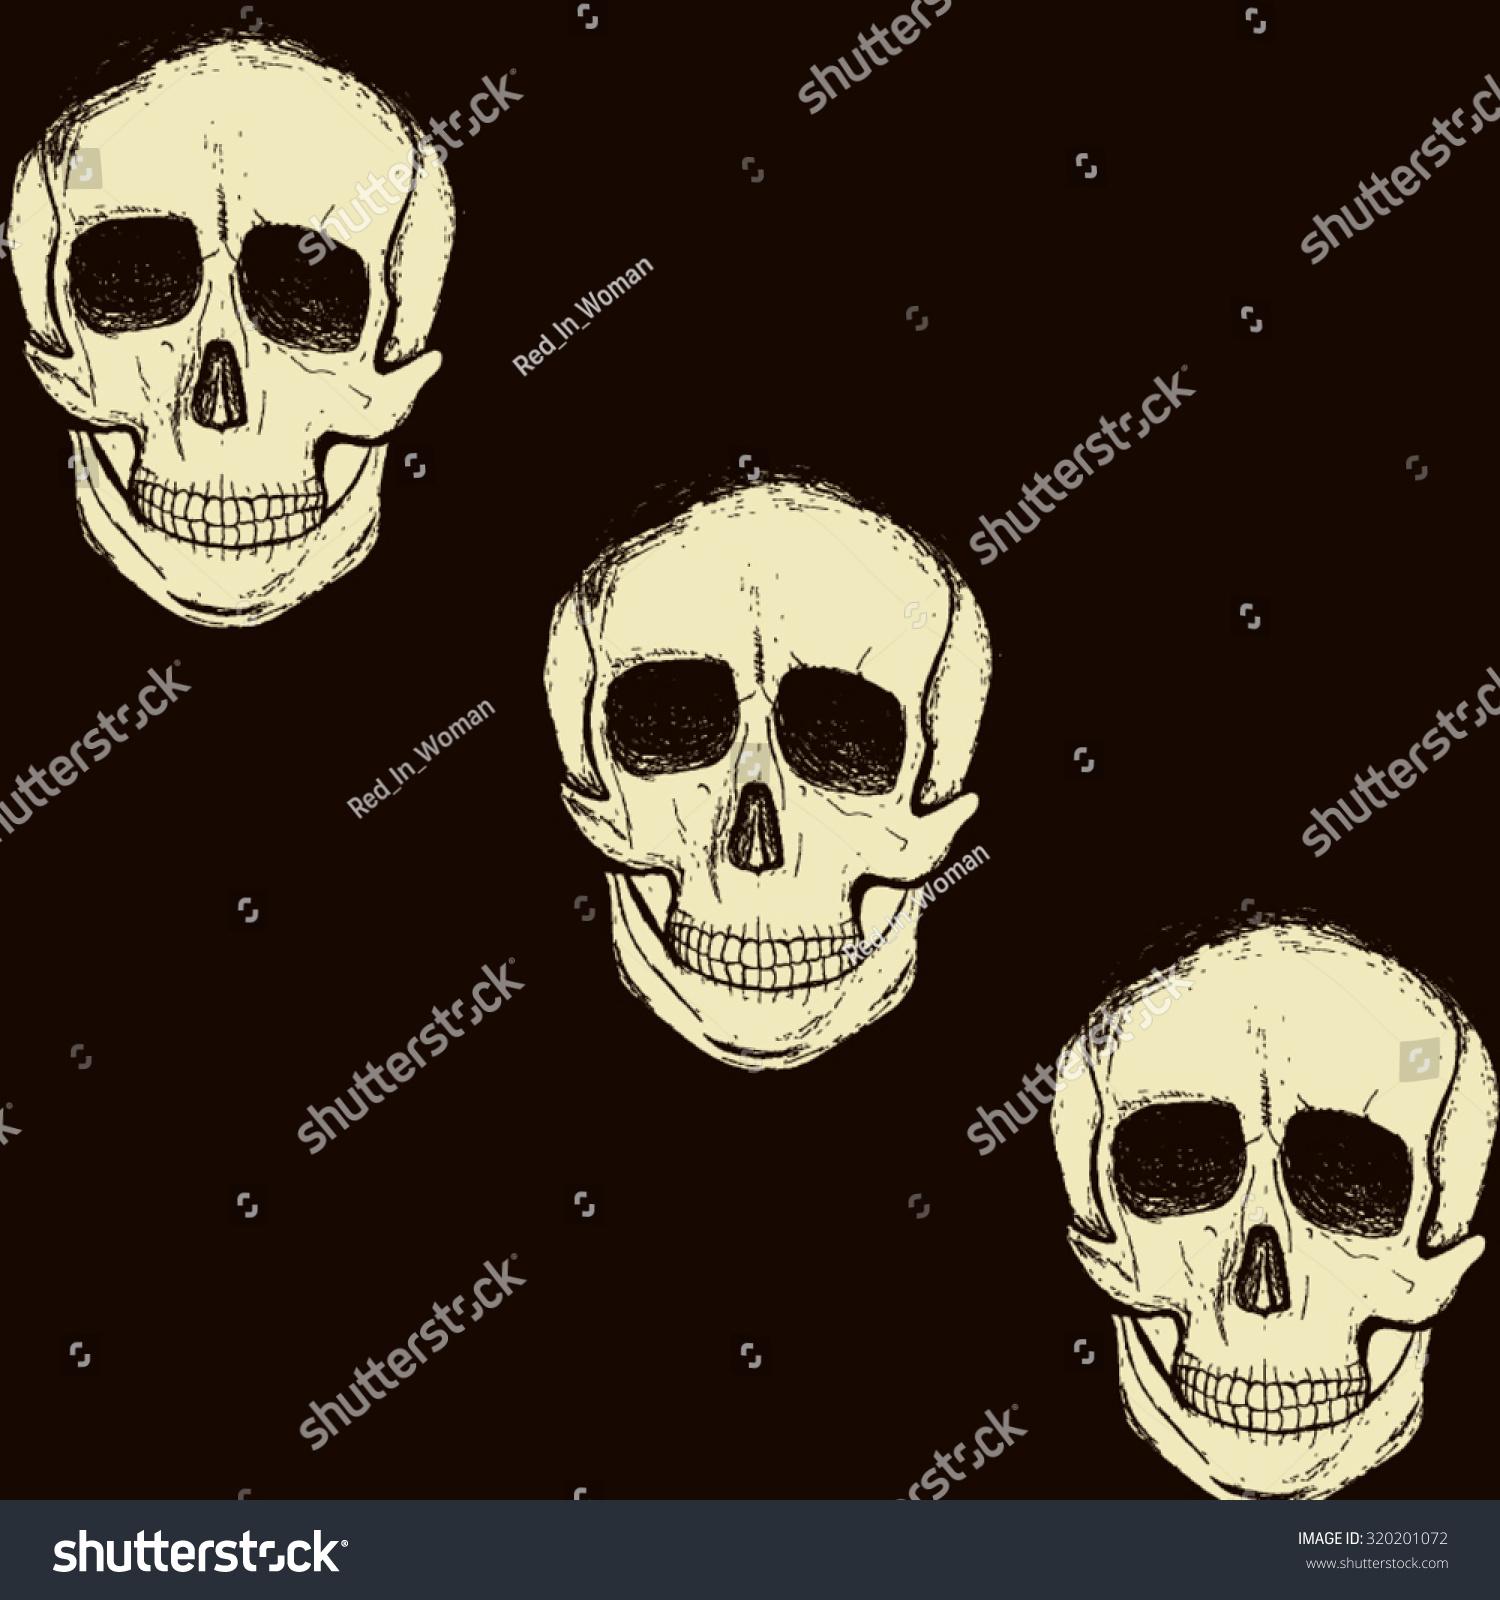 halloween postcard three white diagonally arranged stock vector - Chrispy Halloween